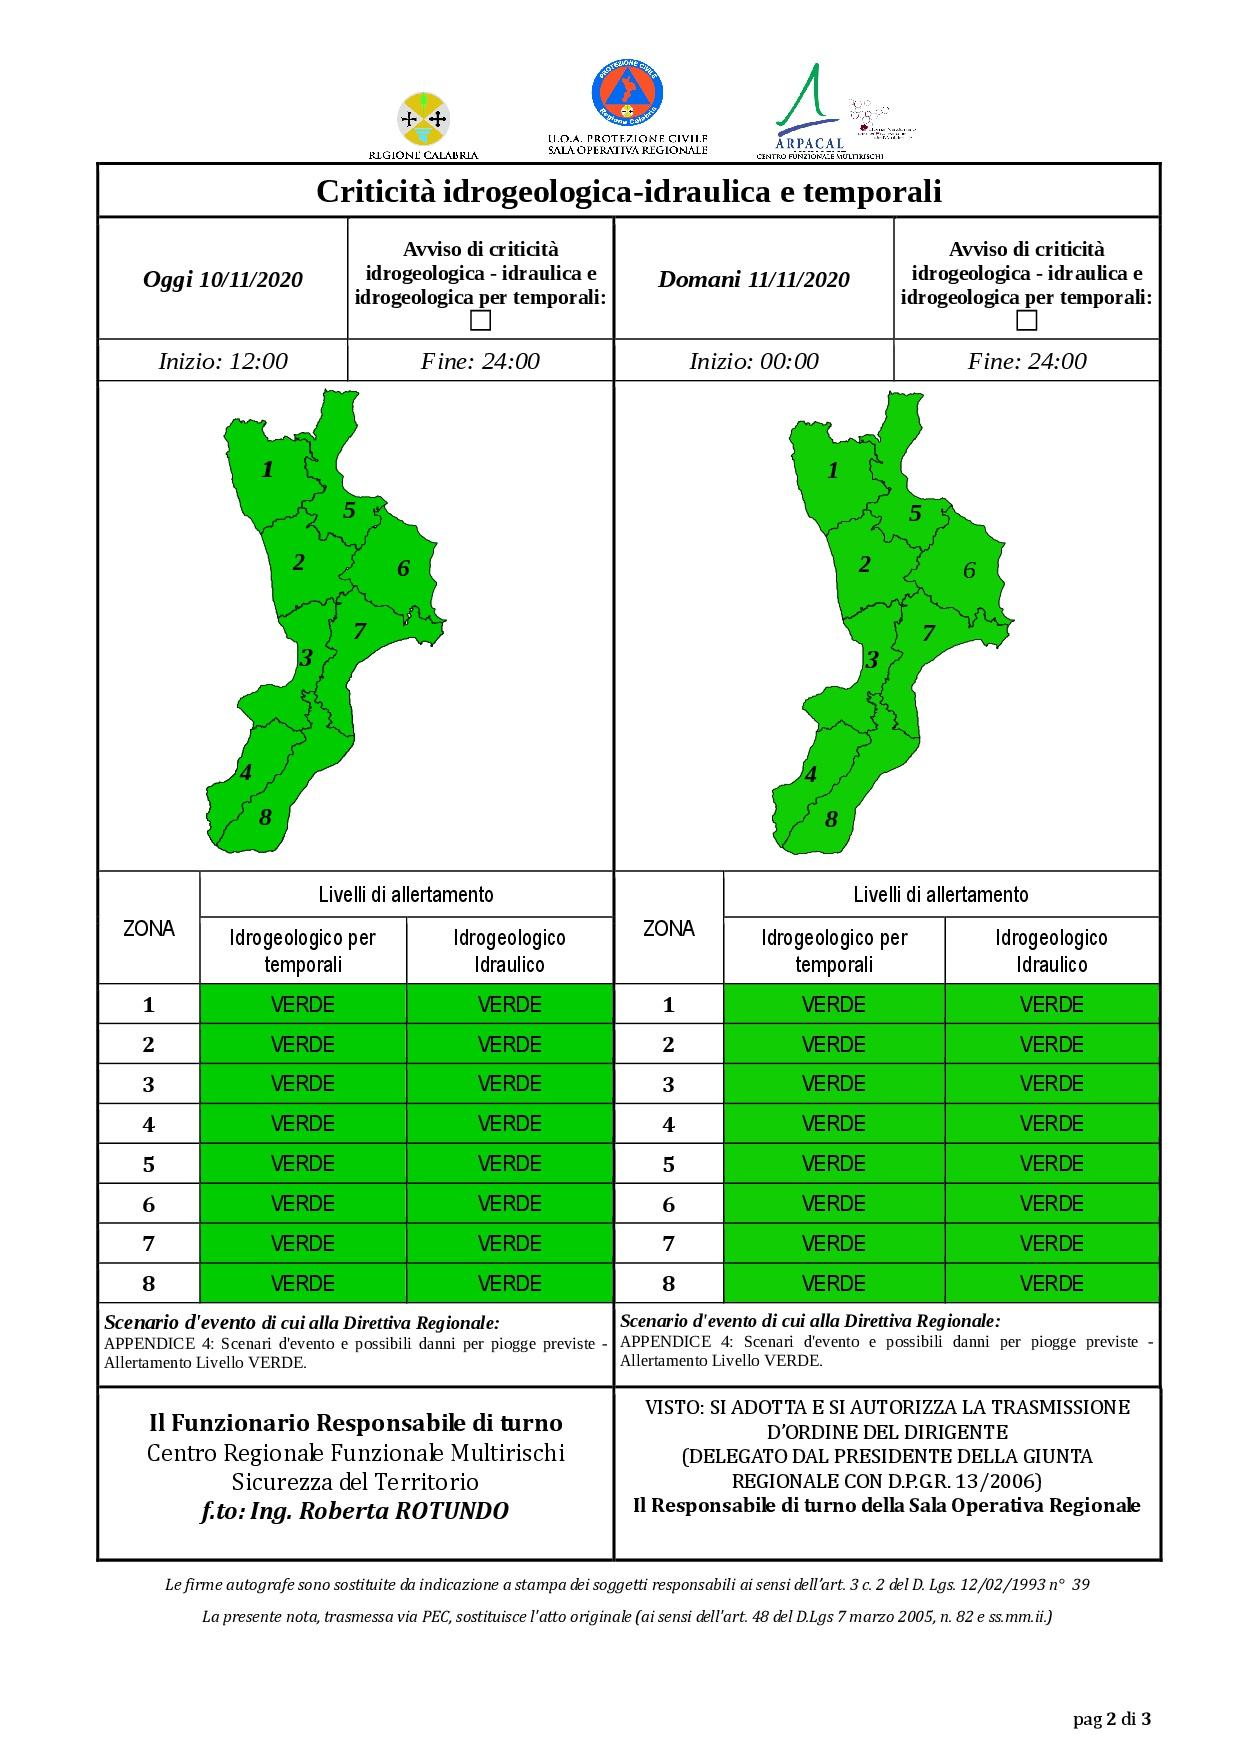 Criticità idrogeologica-idraulica e temporali in Calabria 10-11-2020